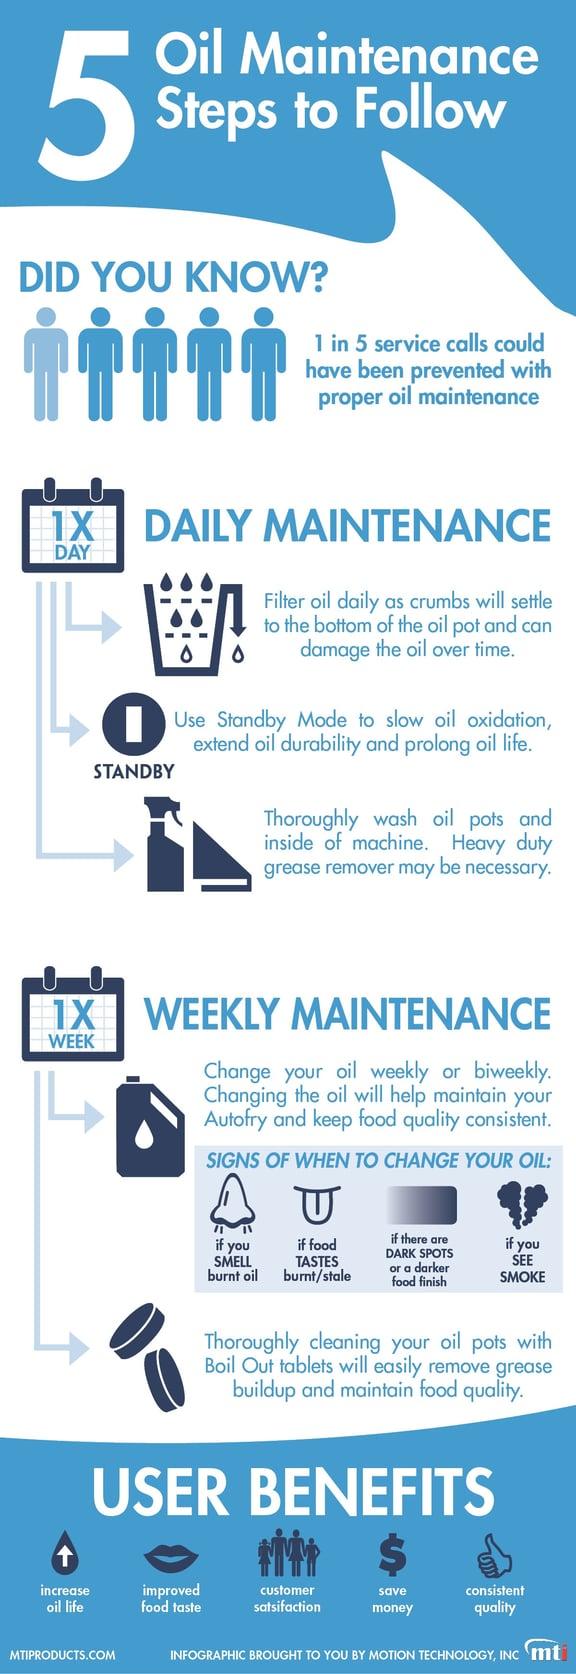 Oil Maintenance Infographic